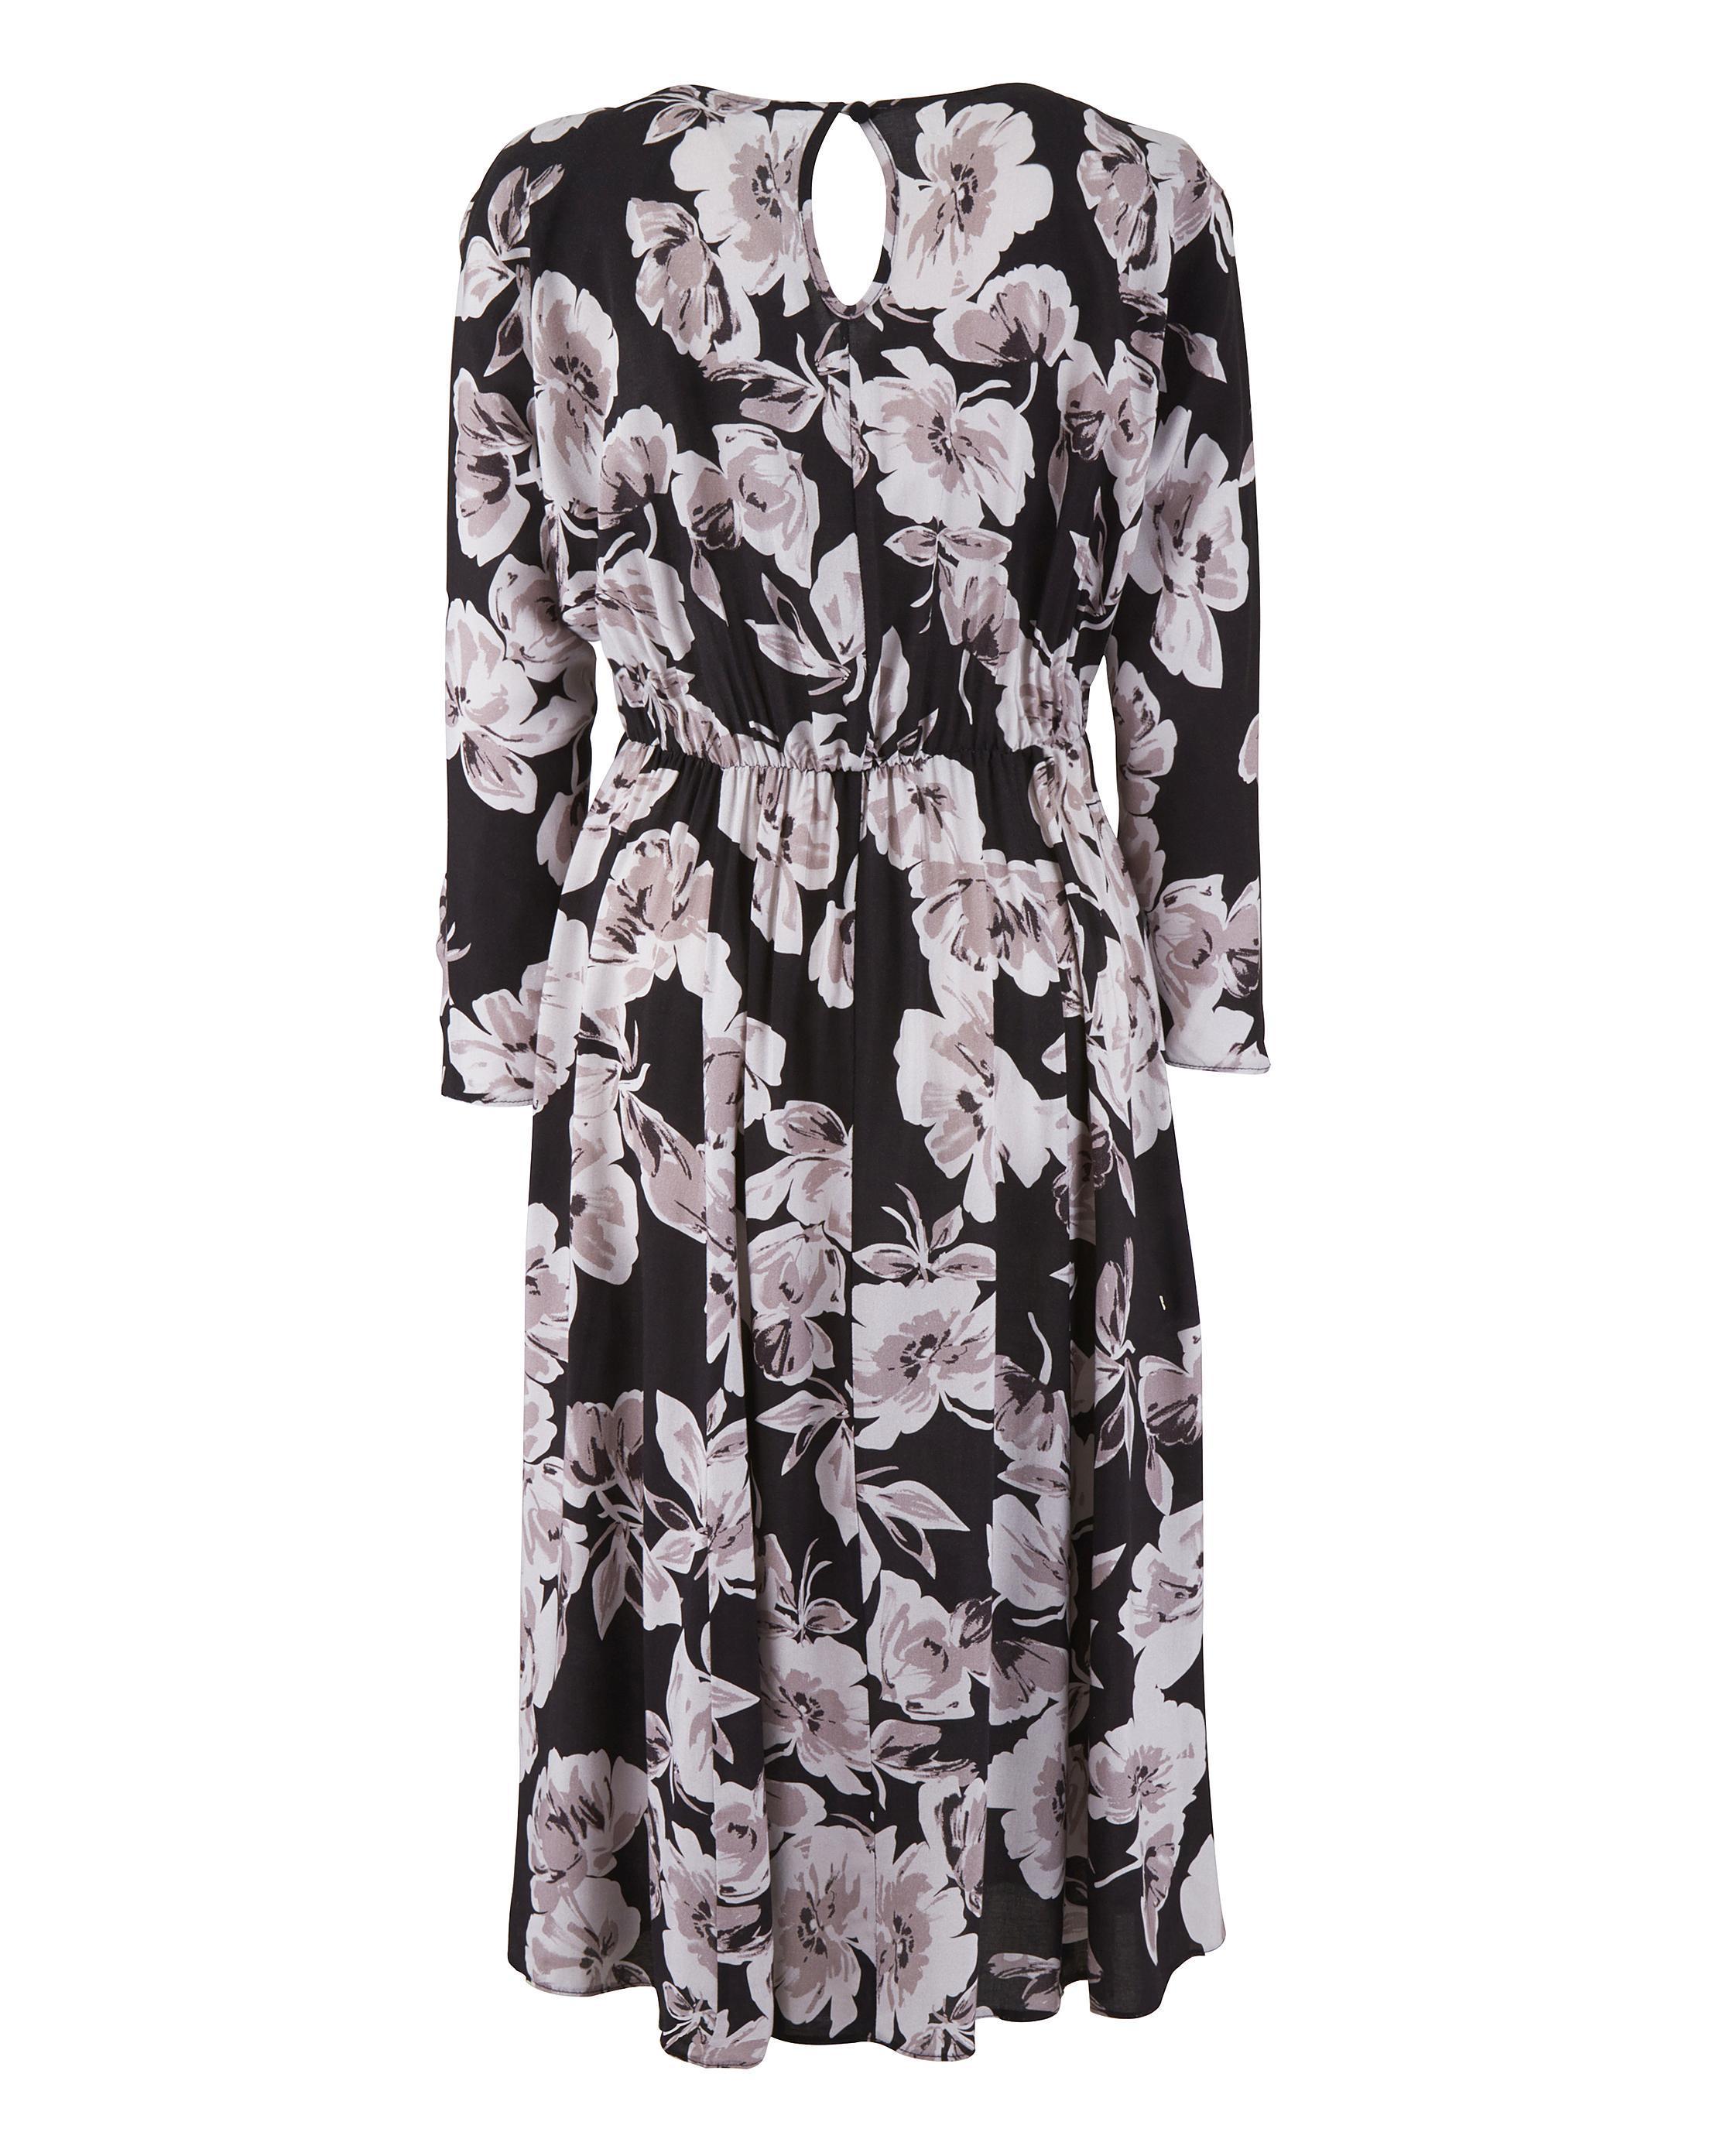 7a17c83a51cf7 Lyst - Simply Be Scarlett   Jo Floral Dress